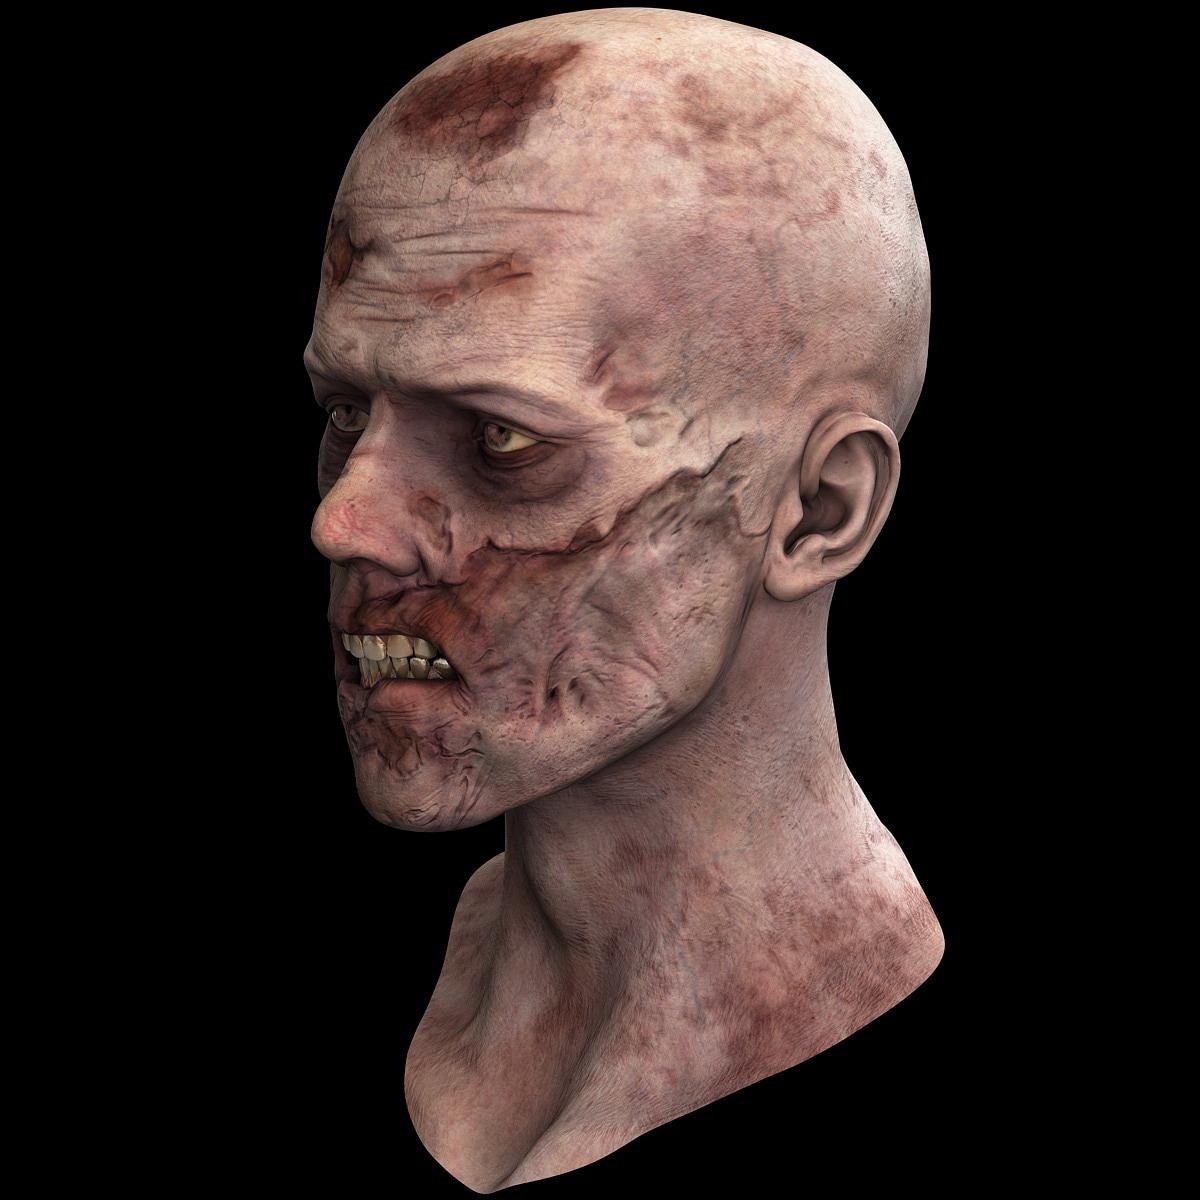 Zombie_Head_2_010.jpg